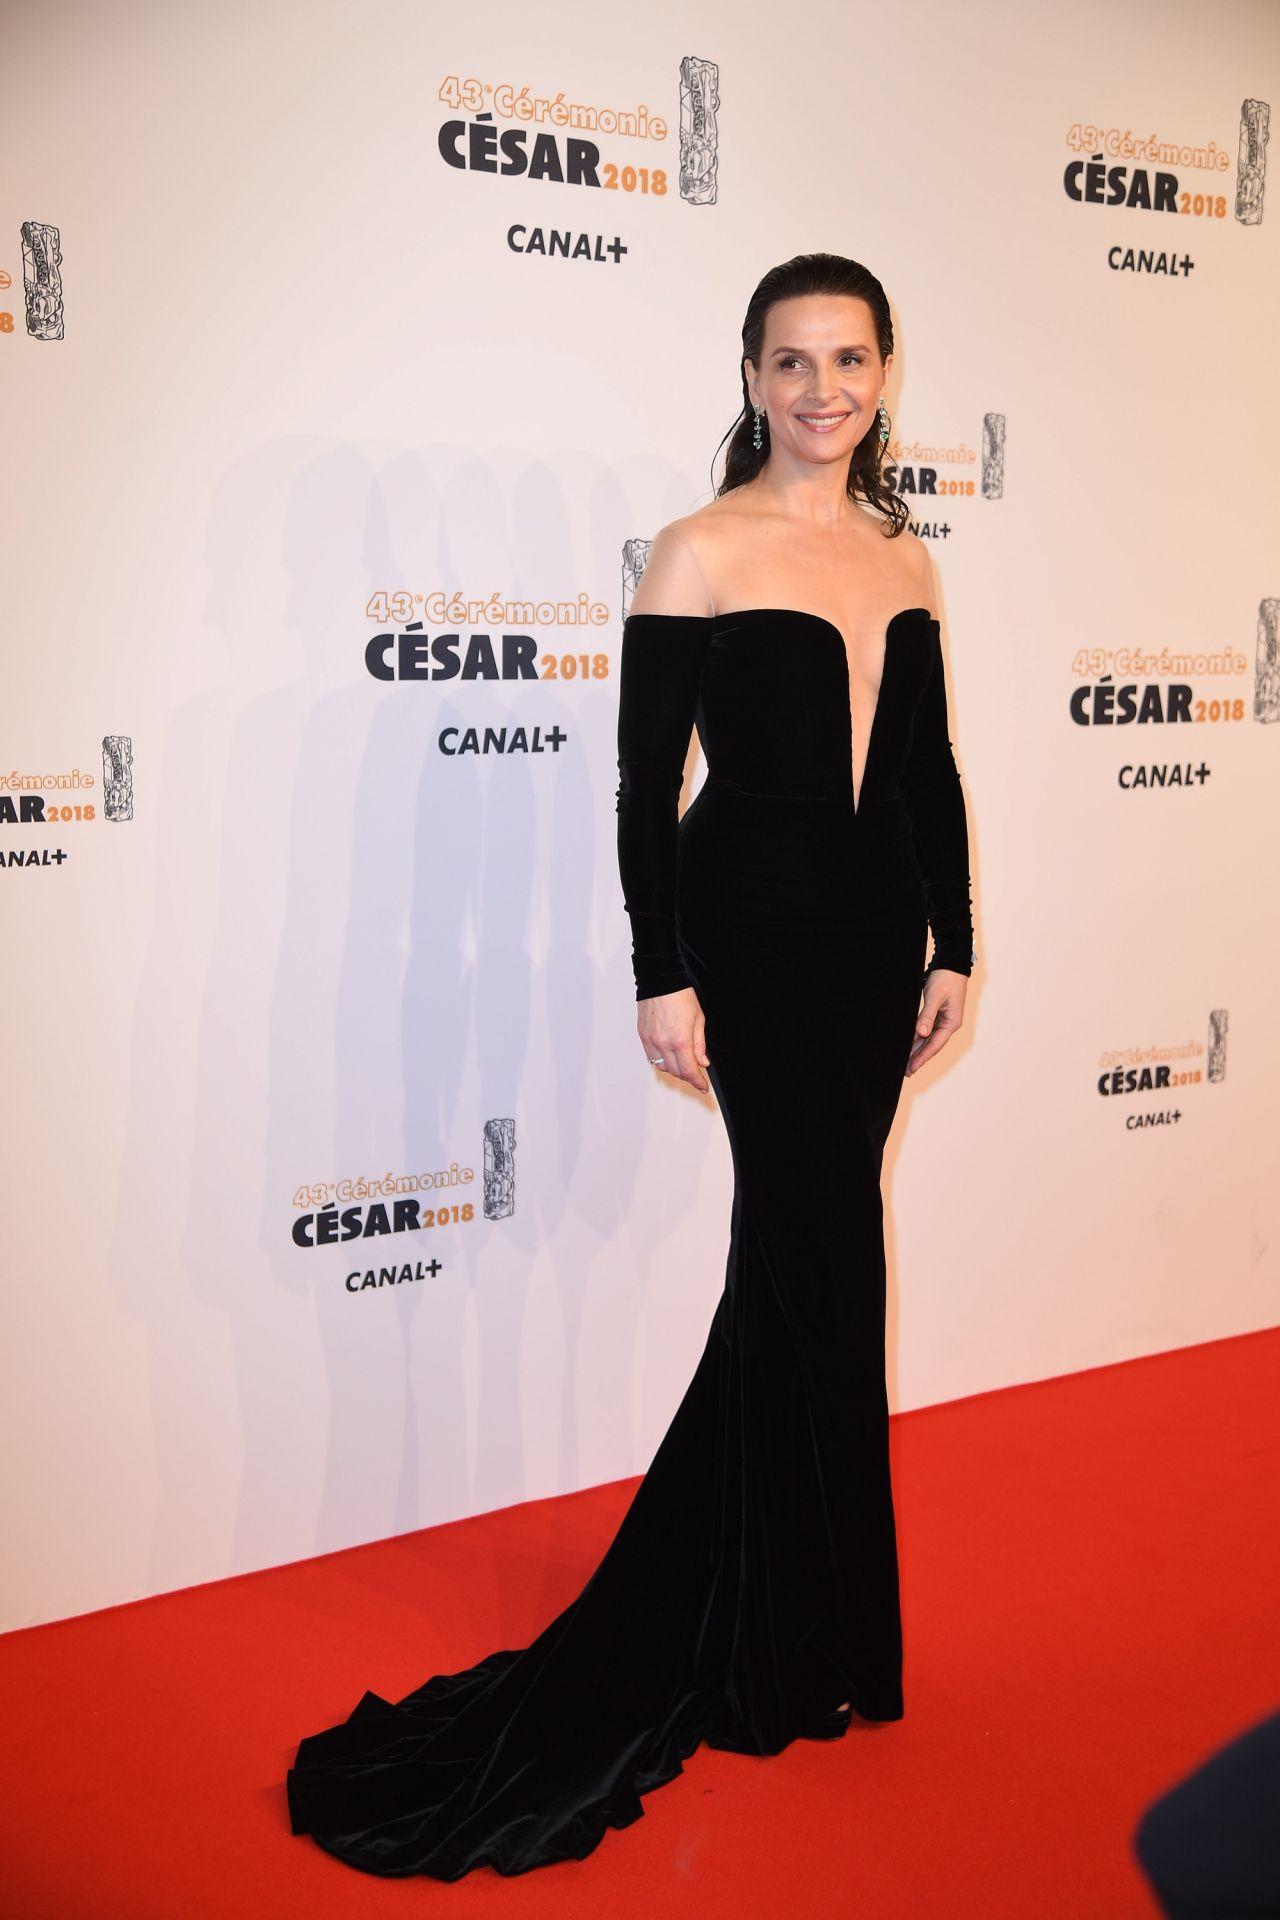 http://celebmafia.com/wp-content/uploads/2018/03/juliette-binoche-cesar-film-awards-2018-in-paris-3.jpg